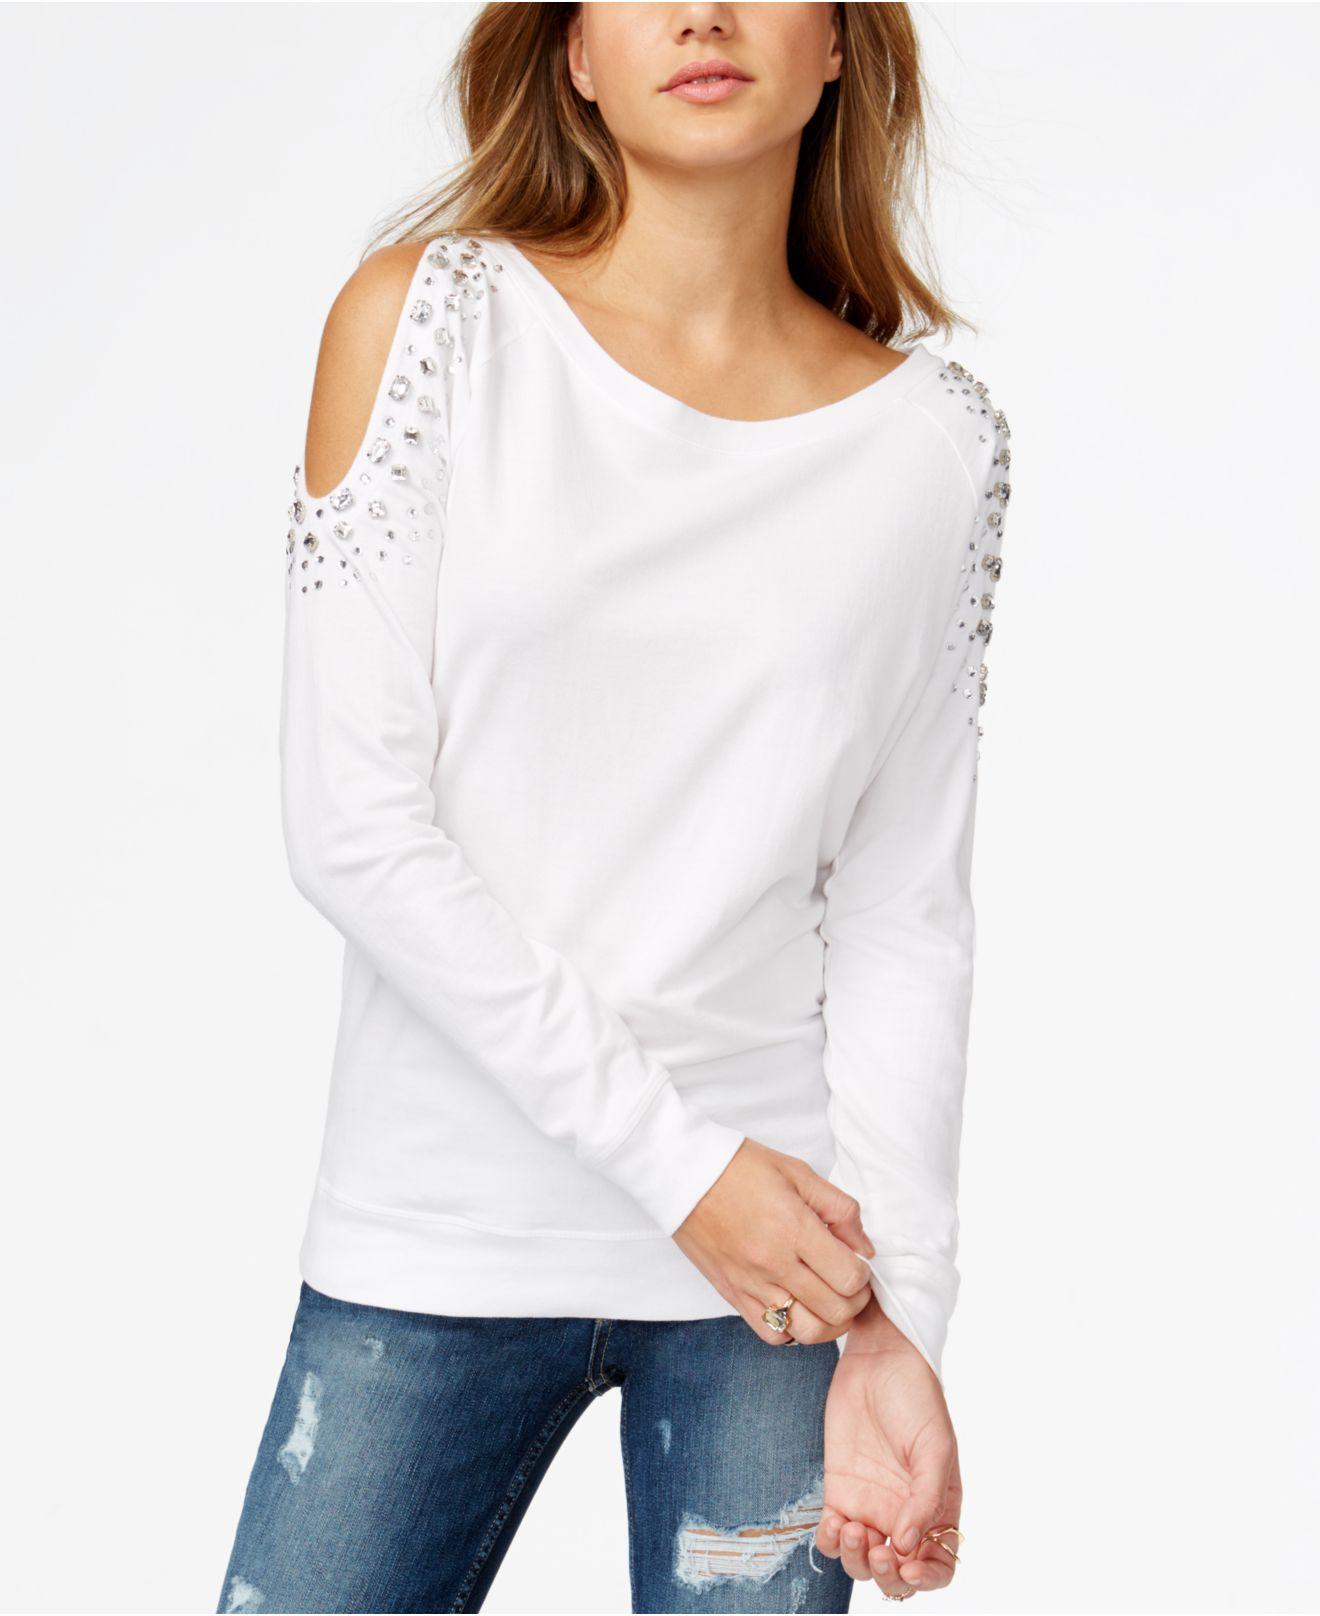 75e9828ba61d5 Lyst - Guess Embellished Cold-shoulder Pullover in White